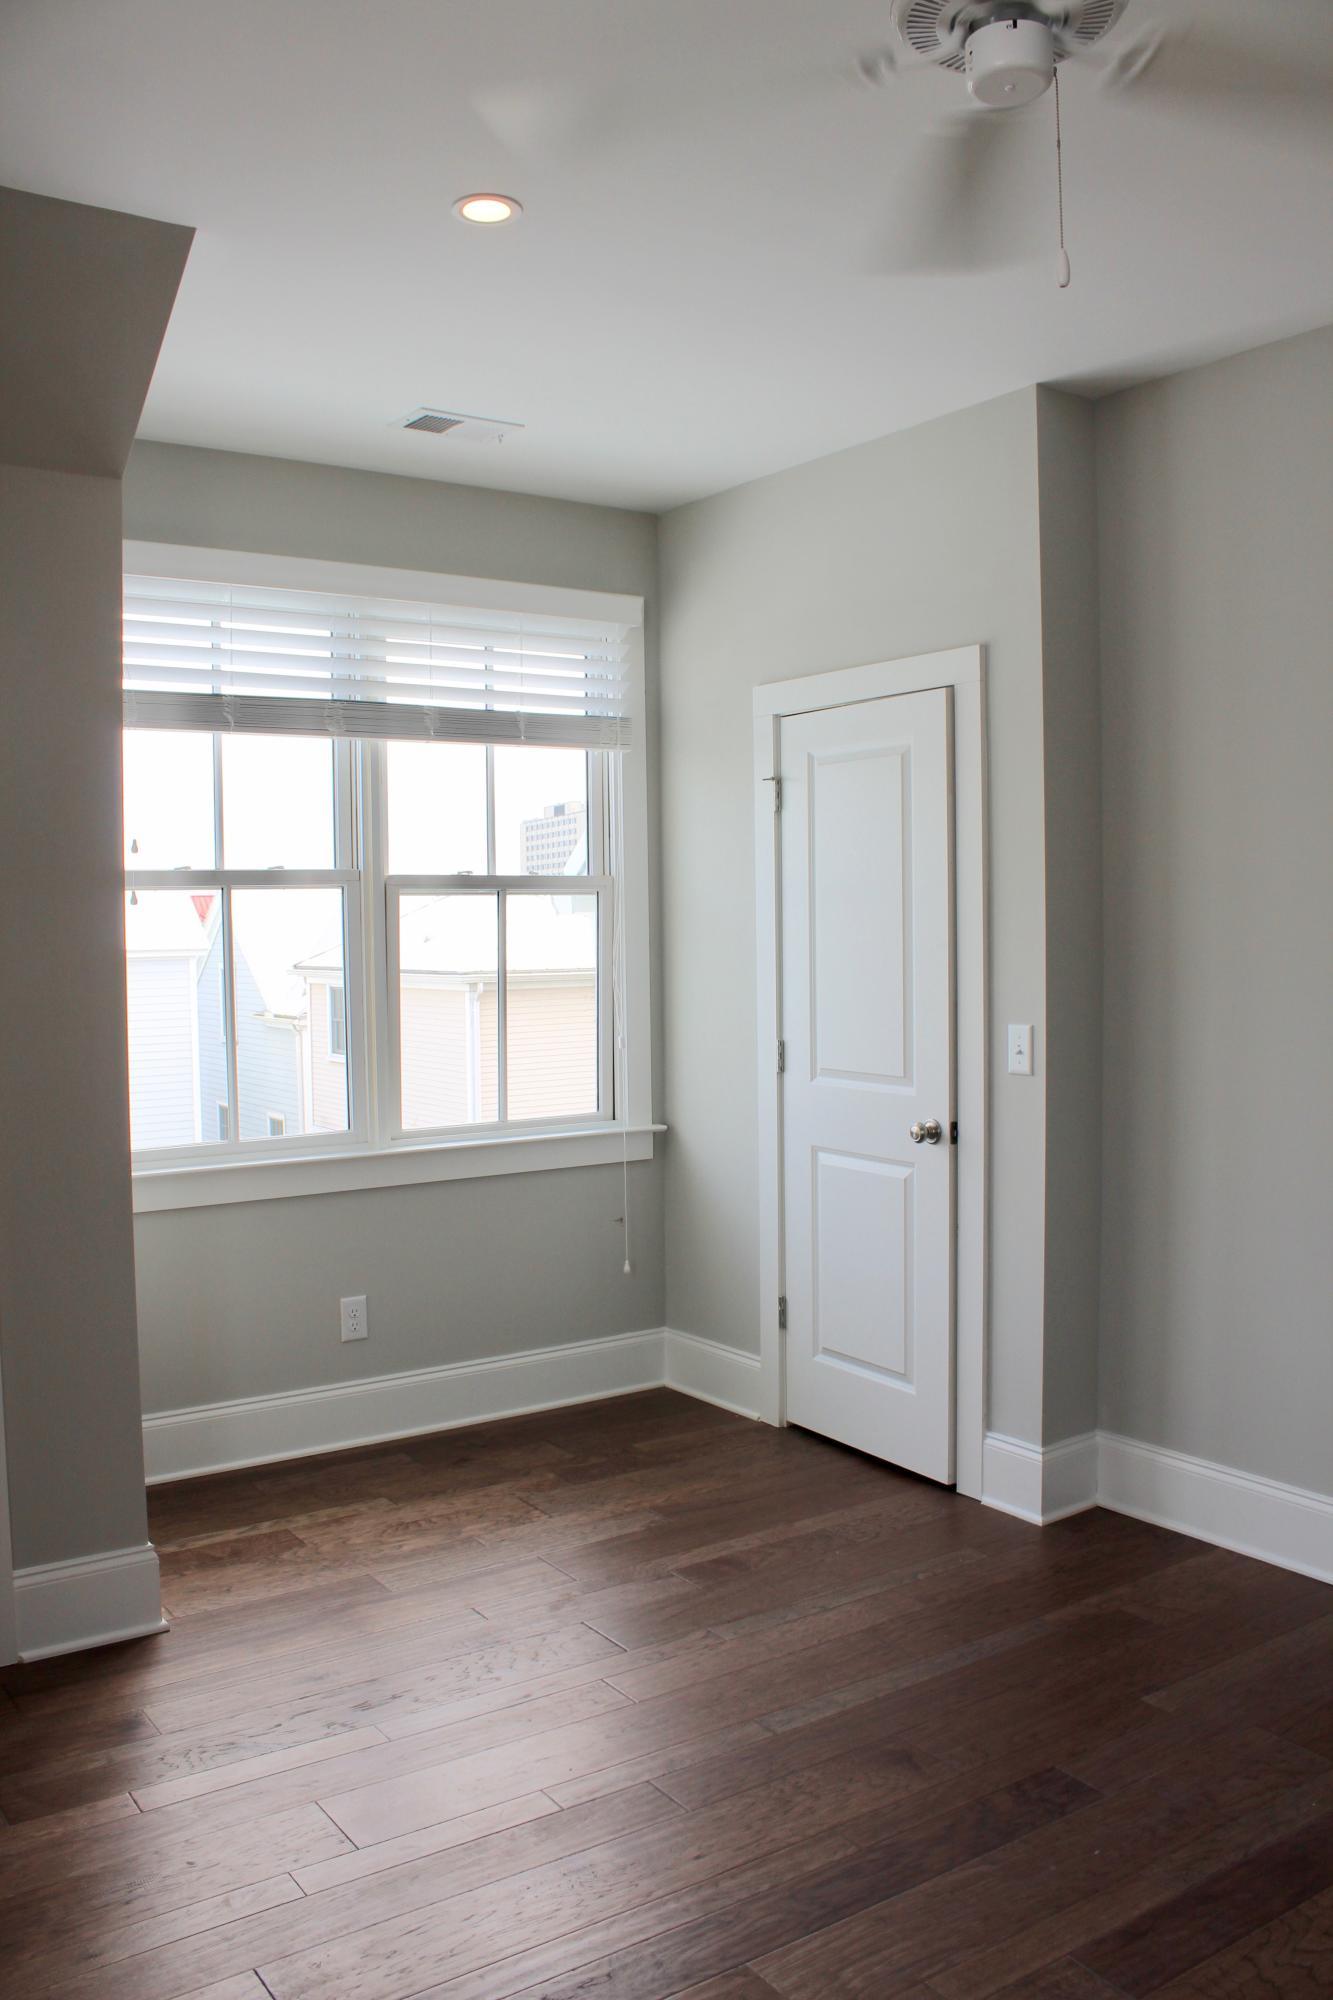 Morris Square Homes For Sale - 46 Dereef, Charleston, SC - 11